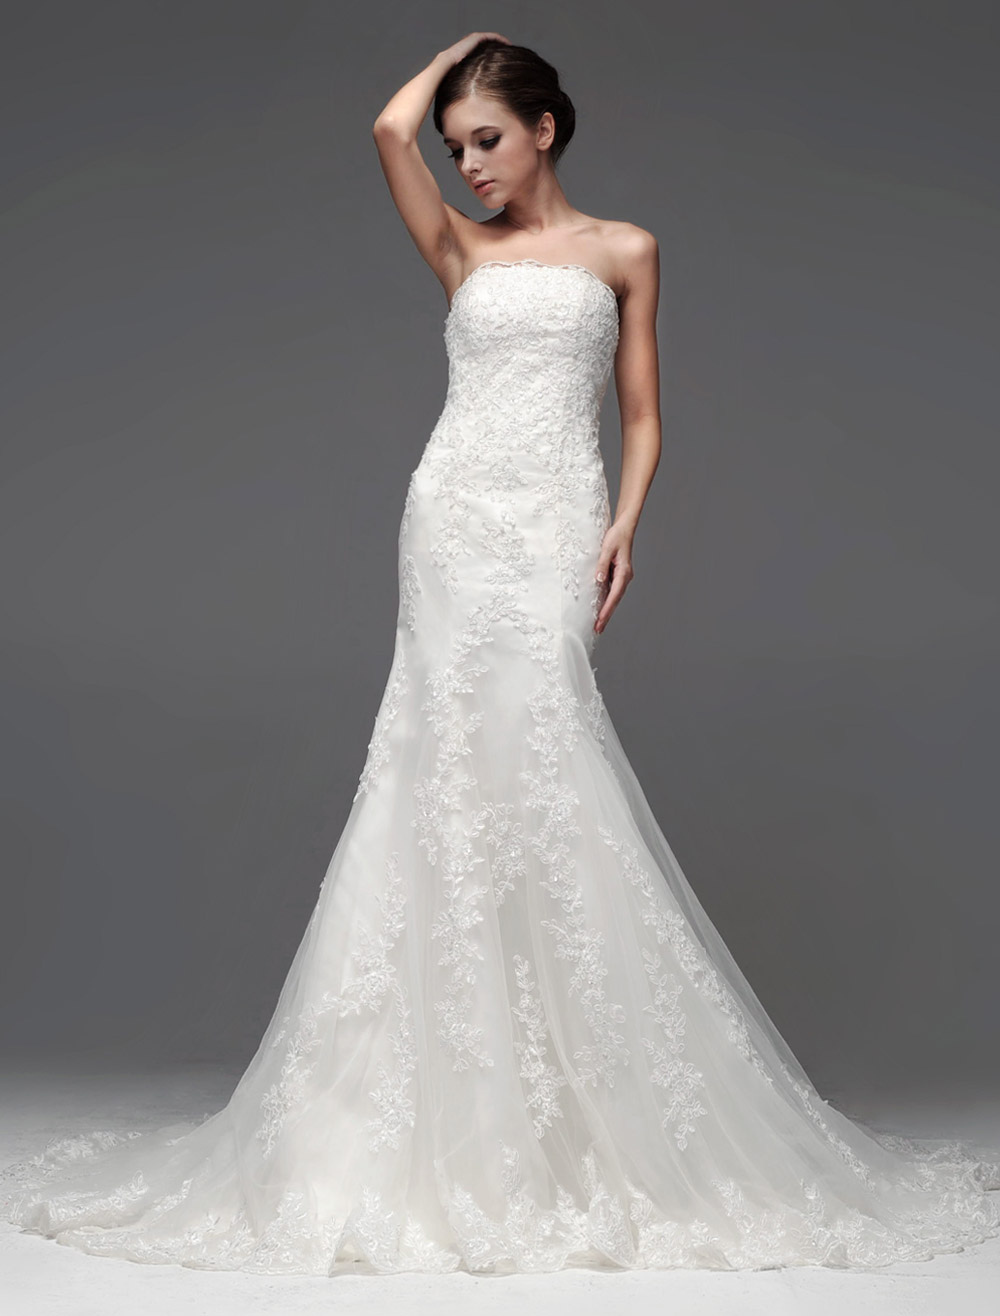 Court Train Strapless Bridal Wedding Dress